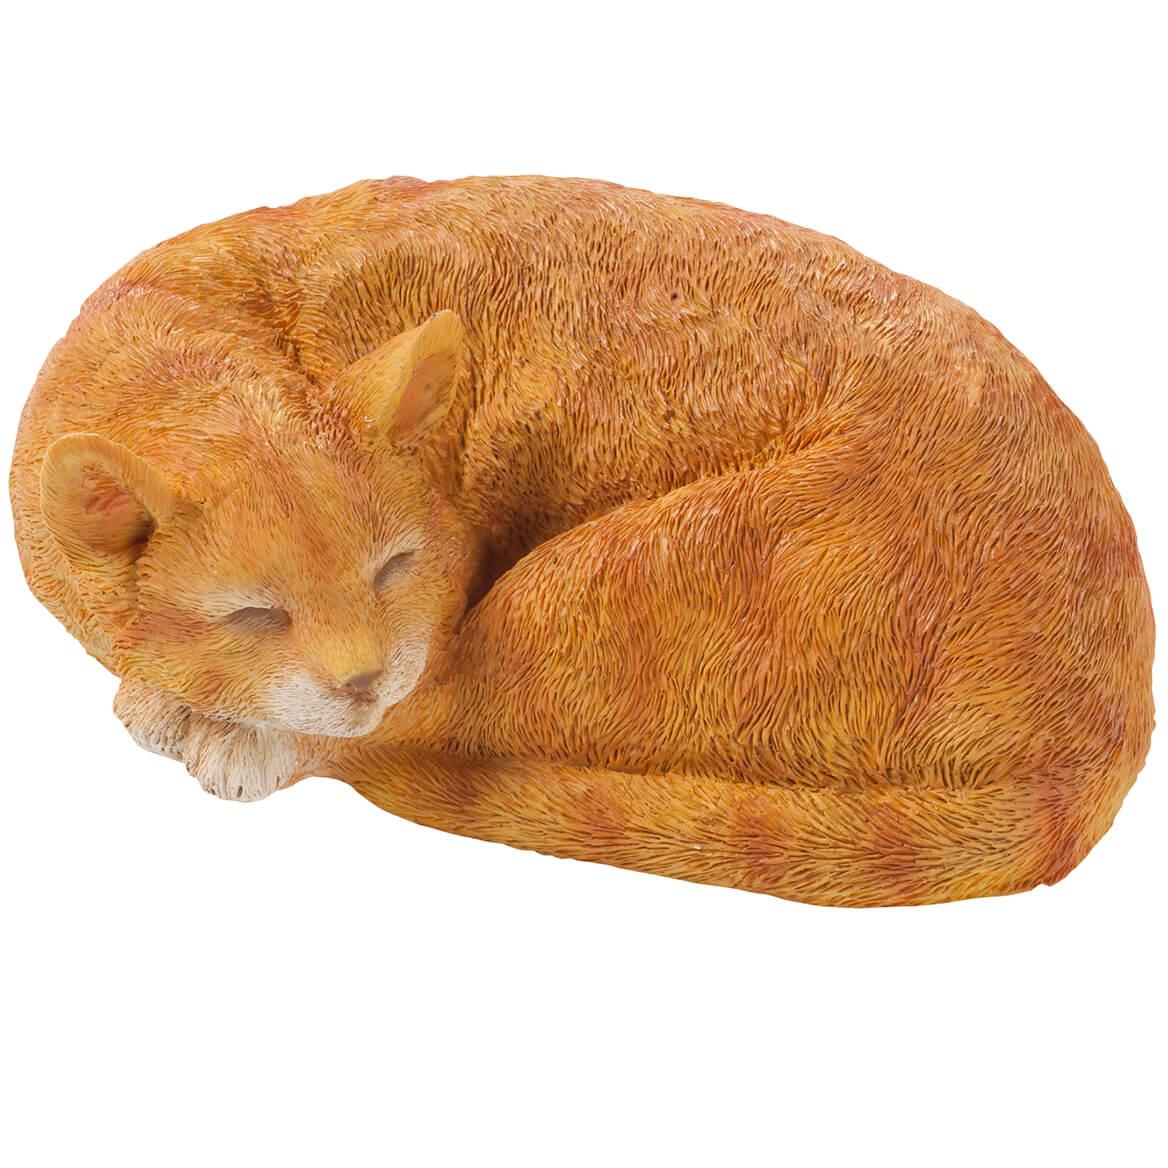 Resin Sleeping Cat Statue